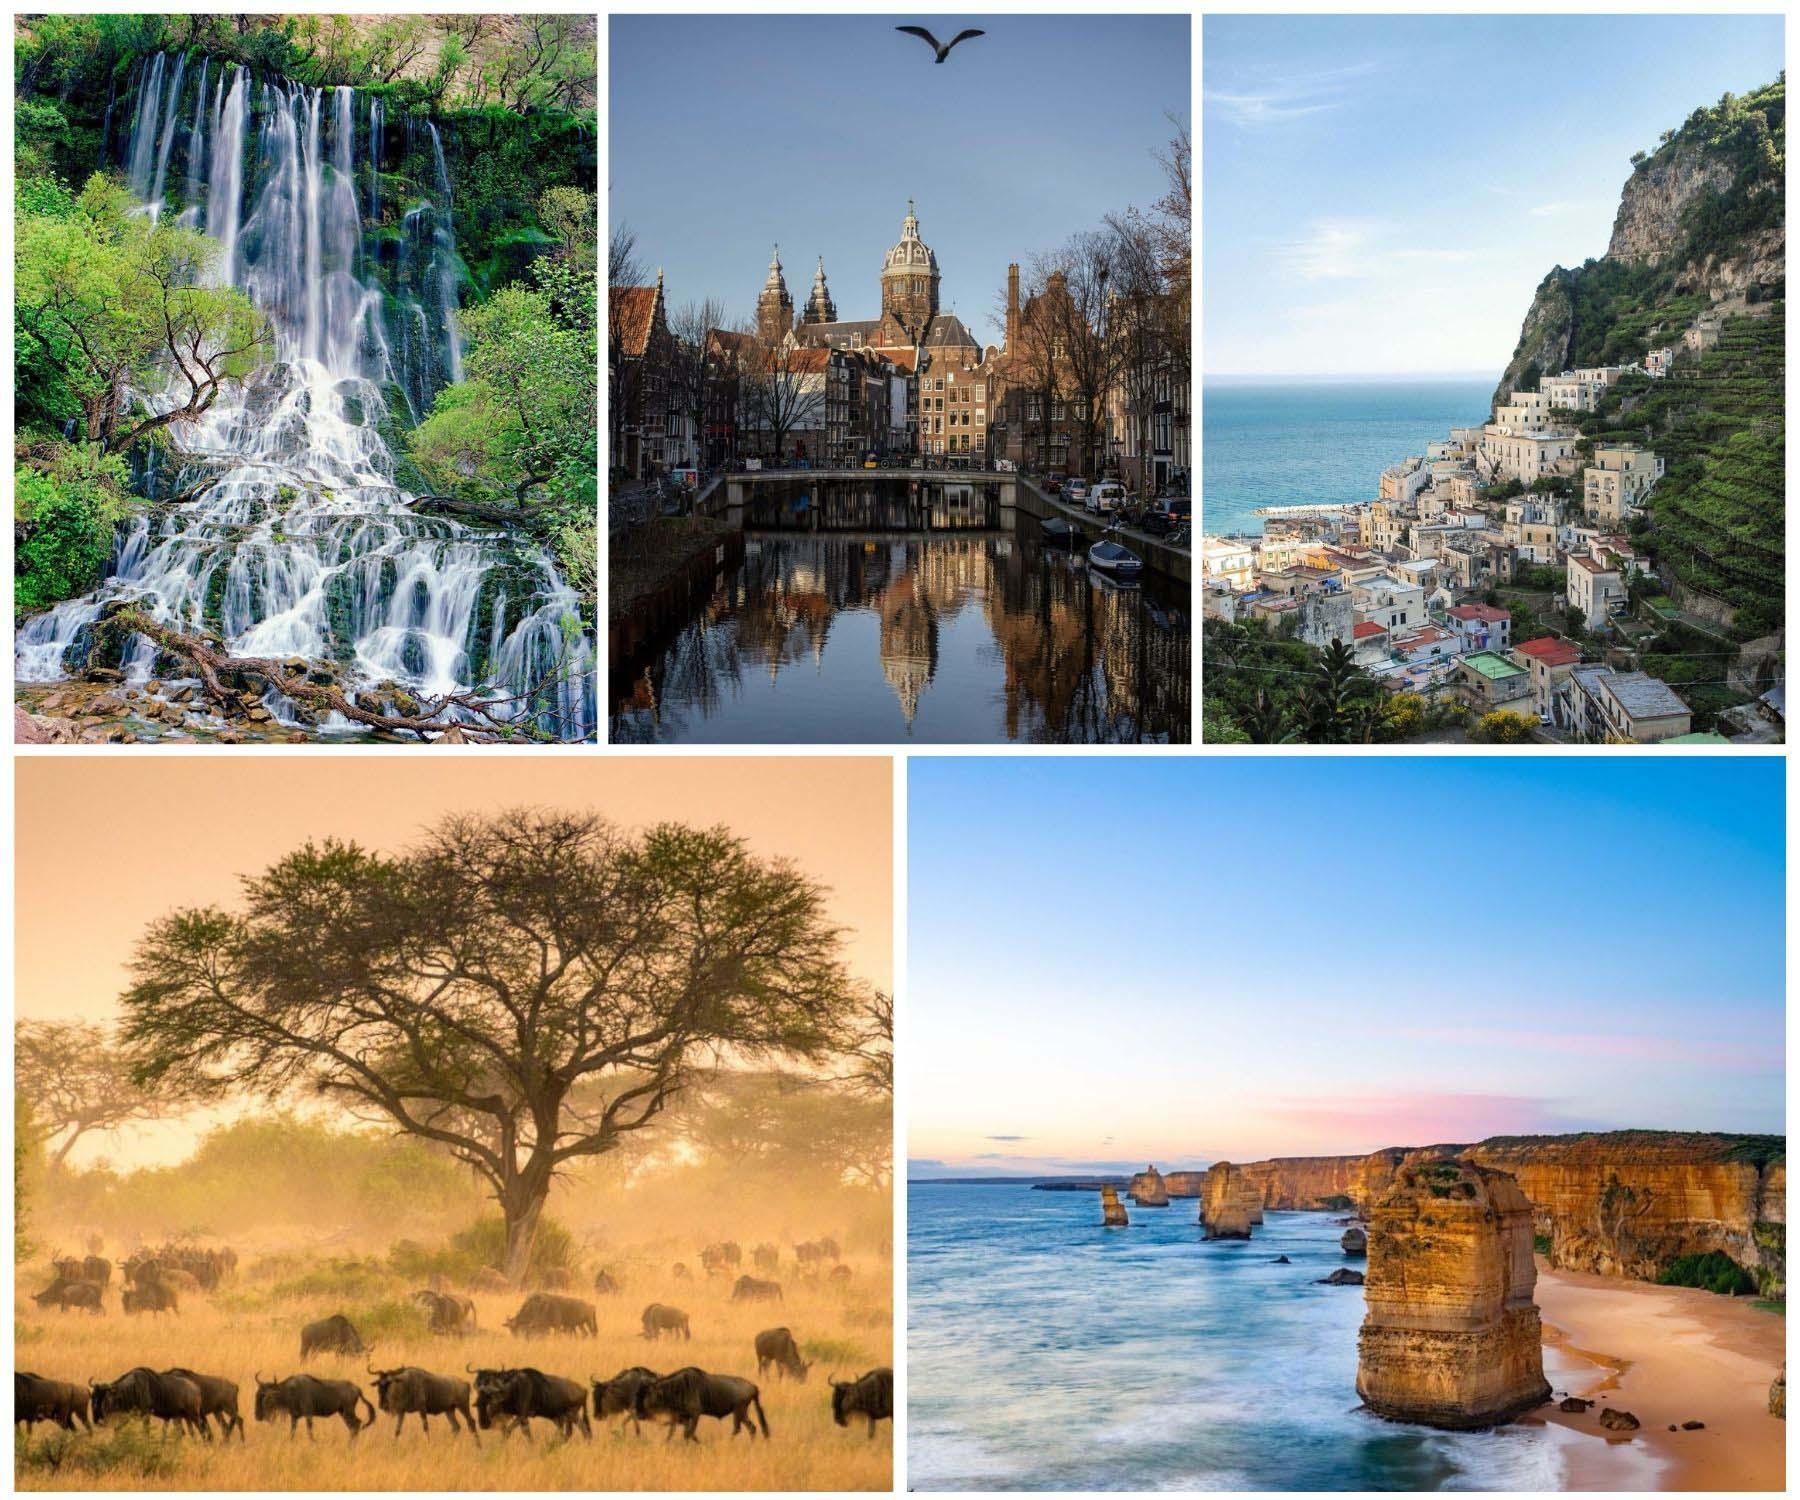 tài khoản instagram du lịch nổi tiếng natgeotravel